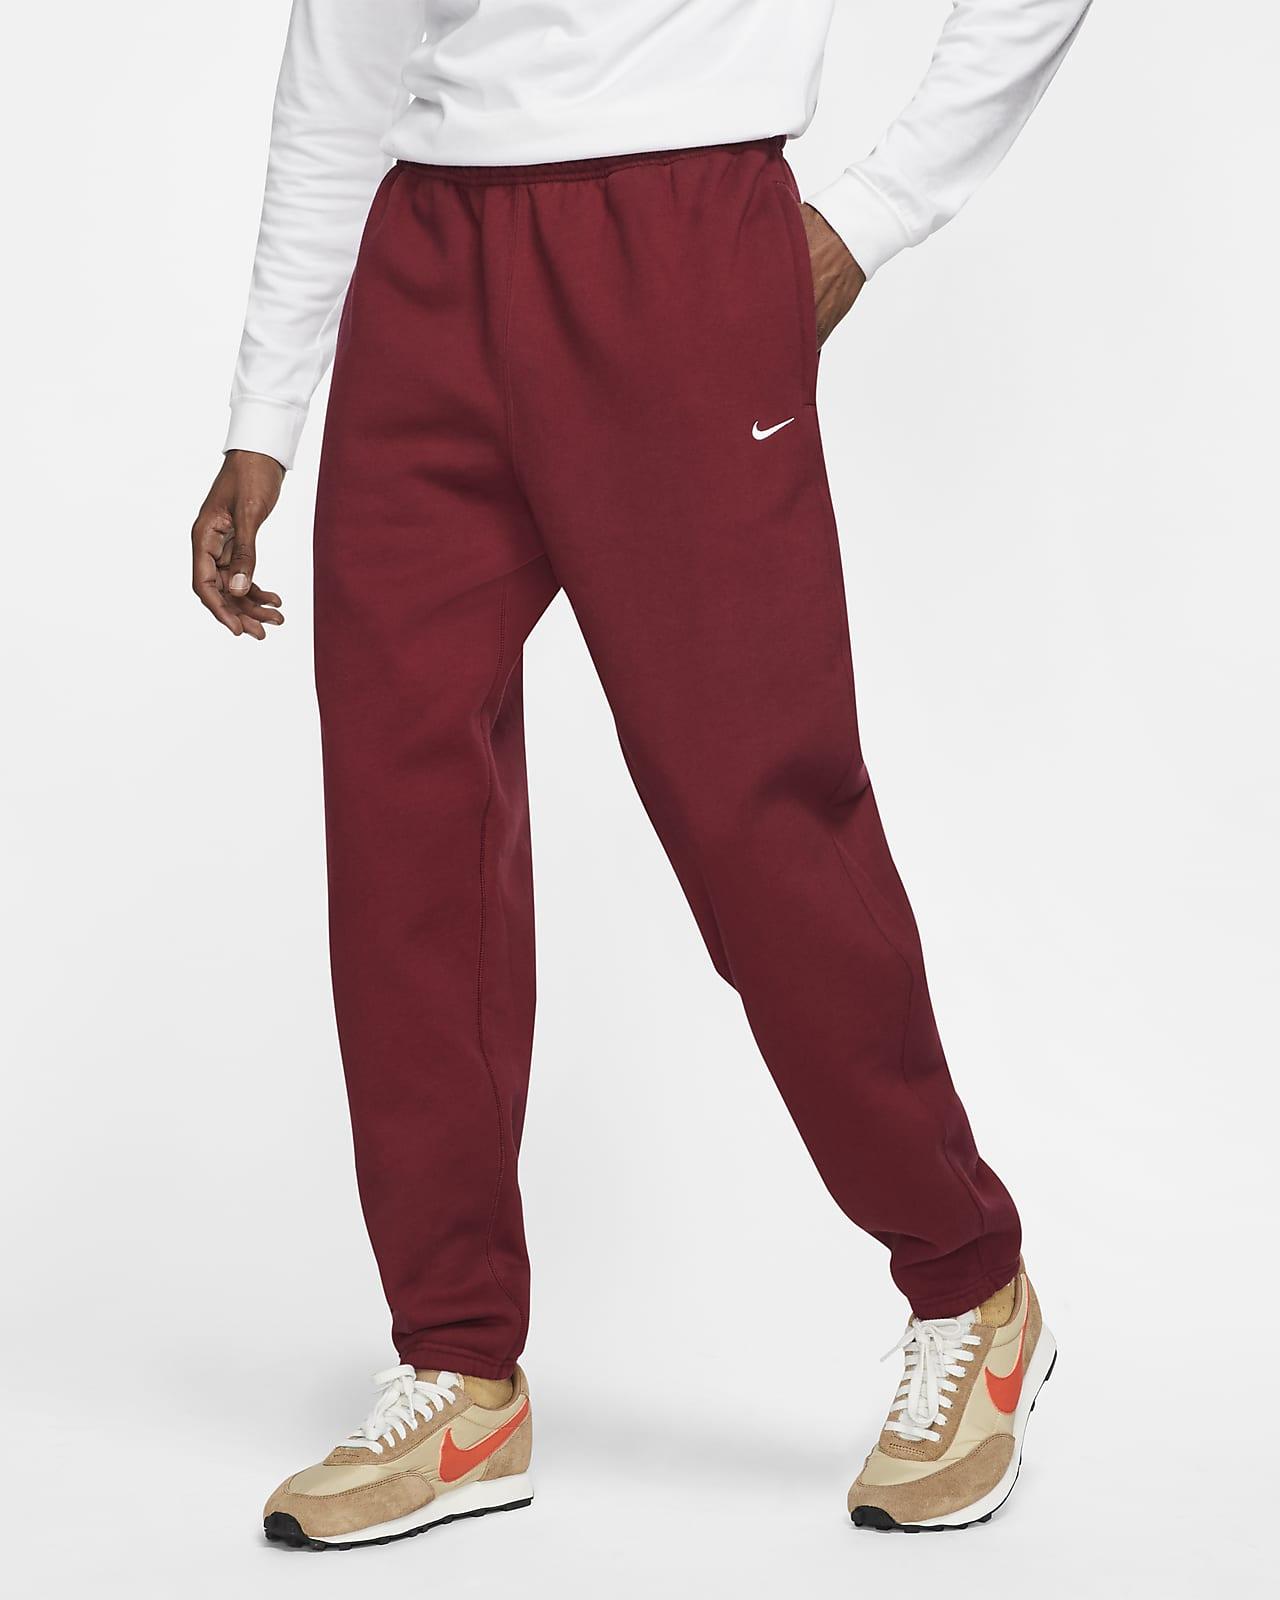 NikeLab Men's Trousers